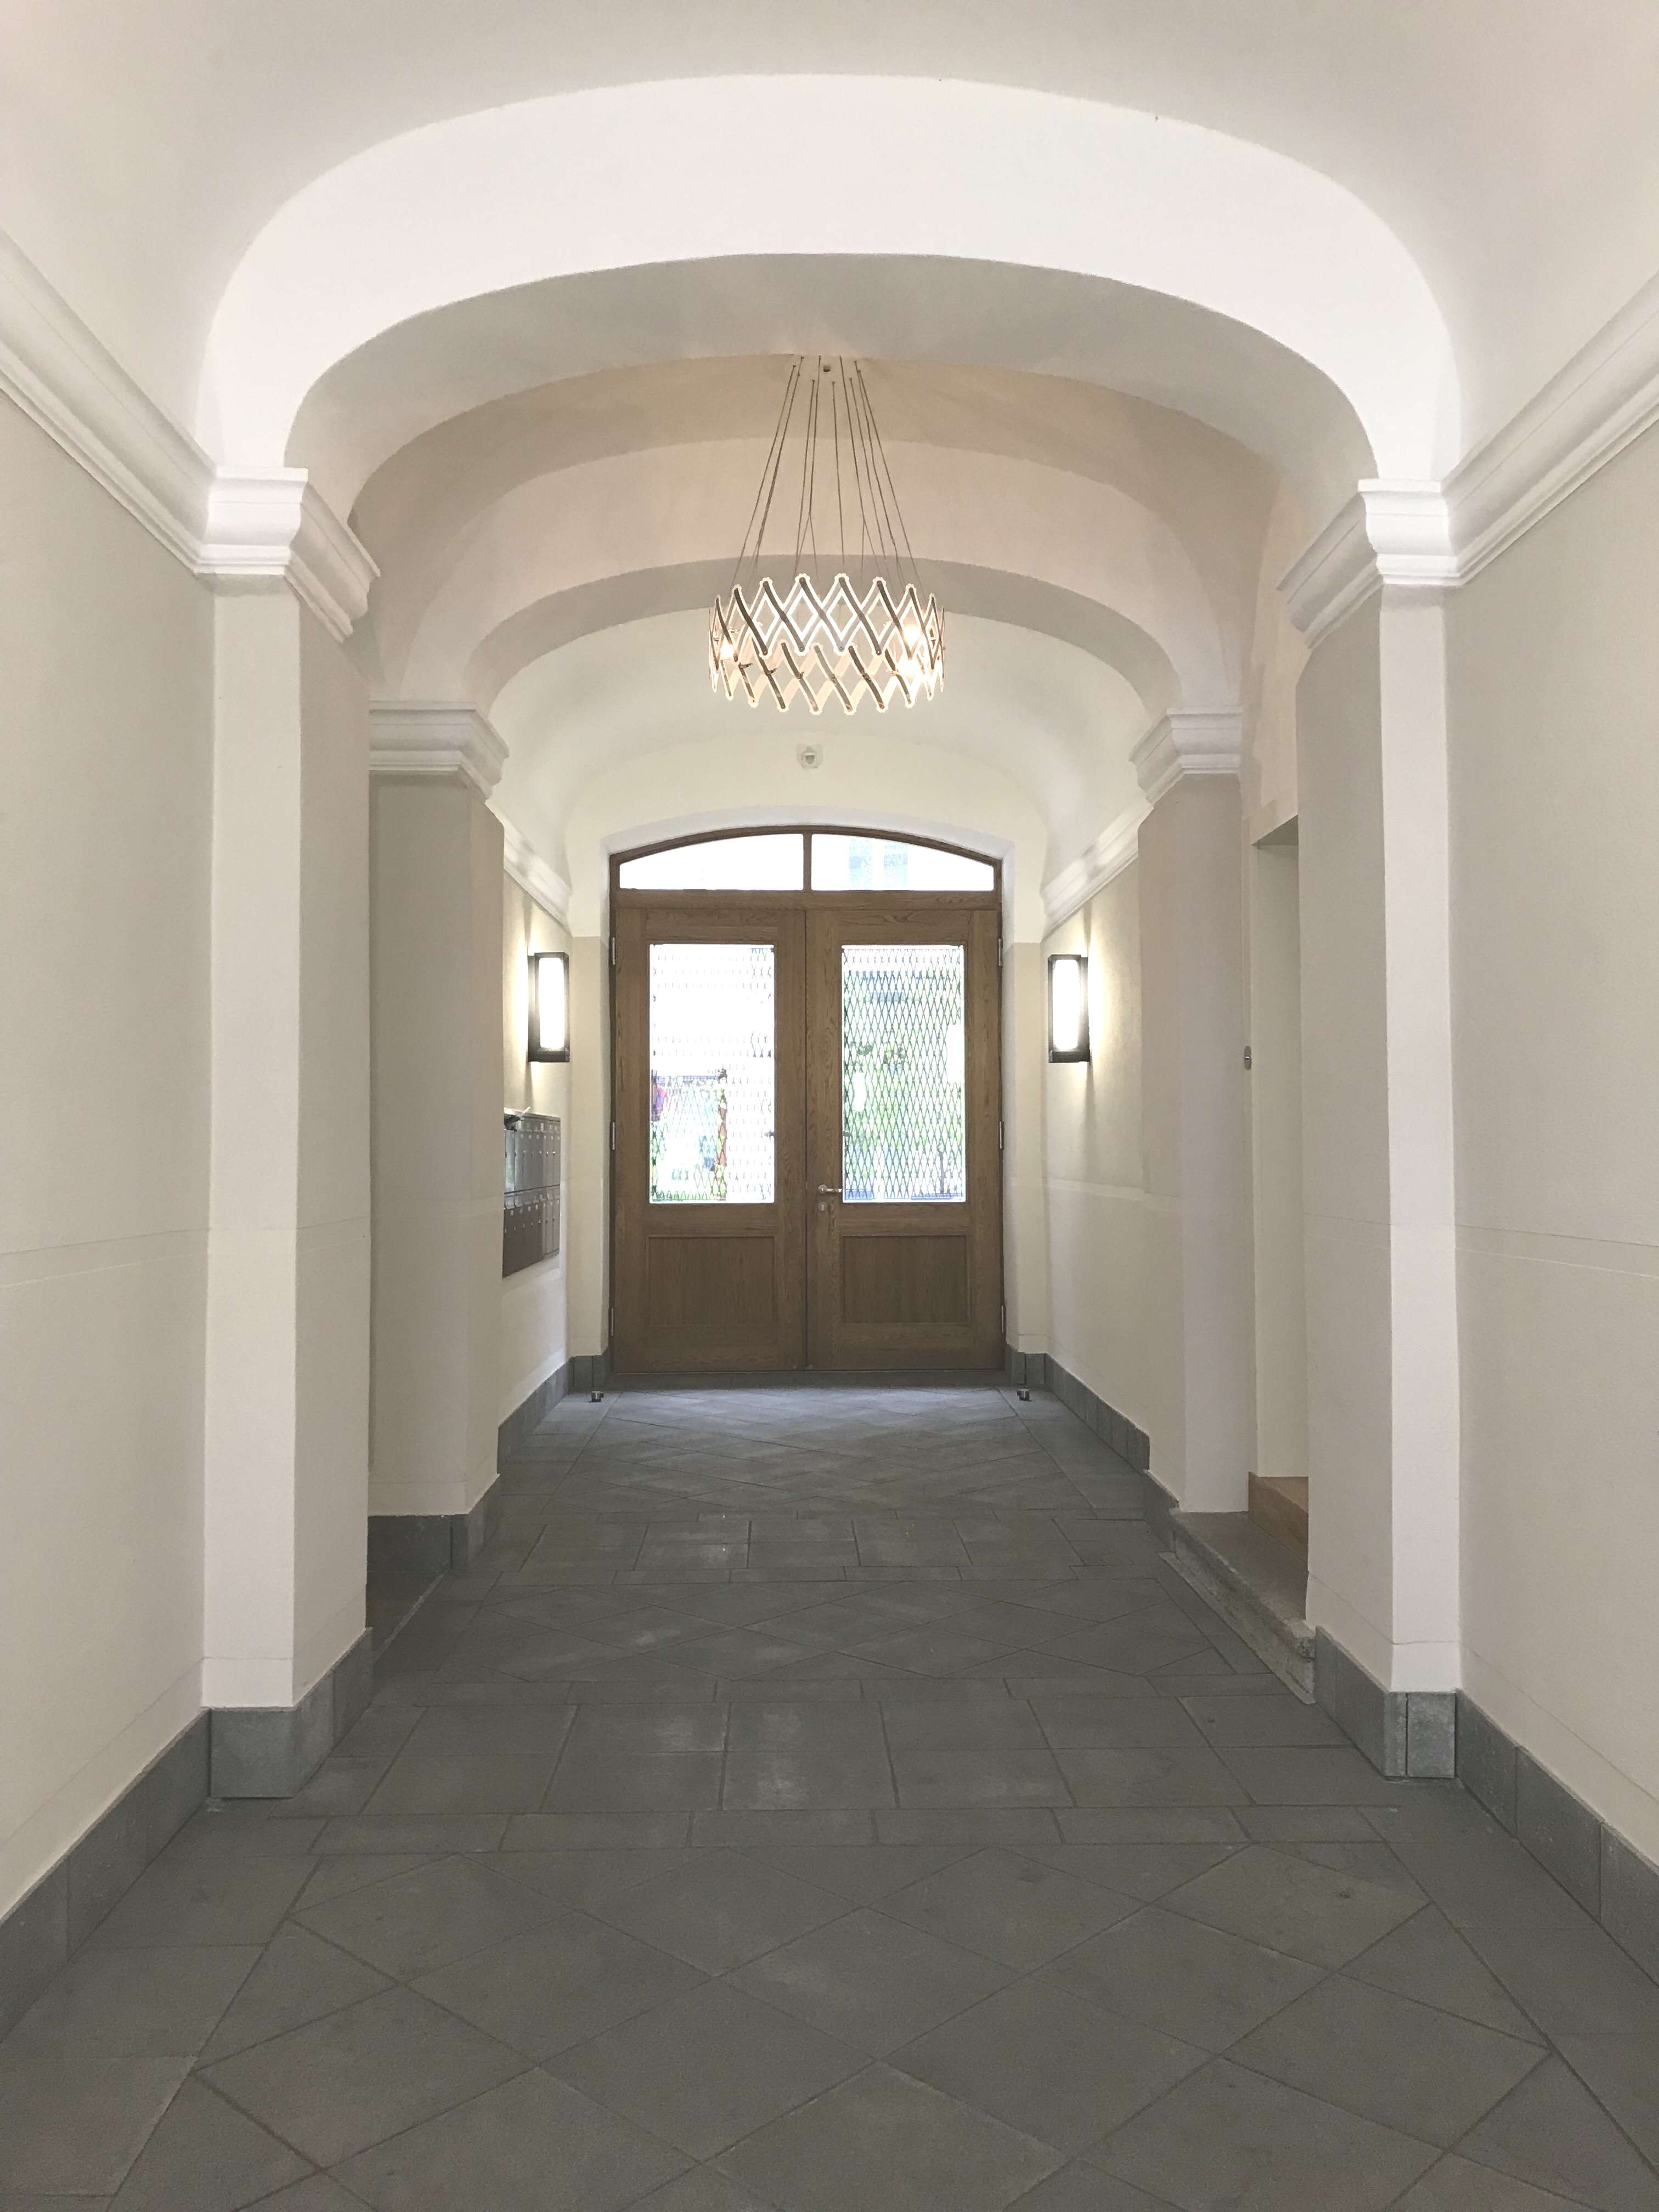 Luxus - Apartment - möbliert - Lehel in Lehel (München)